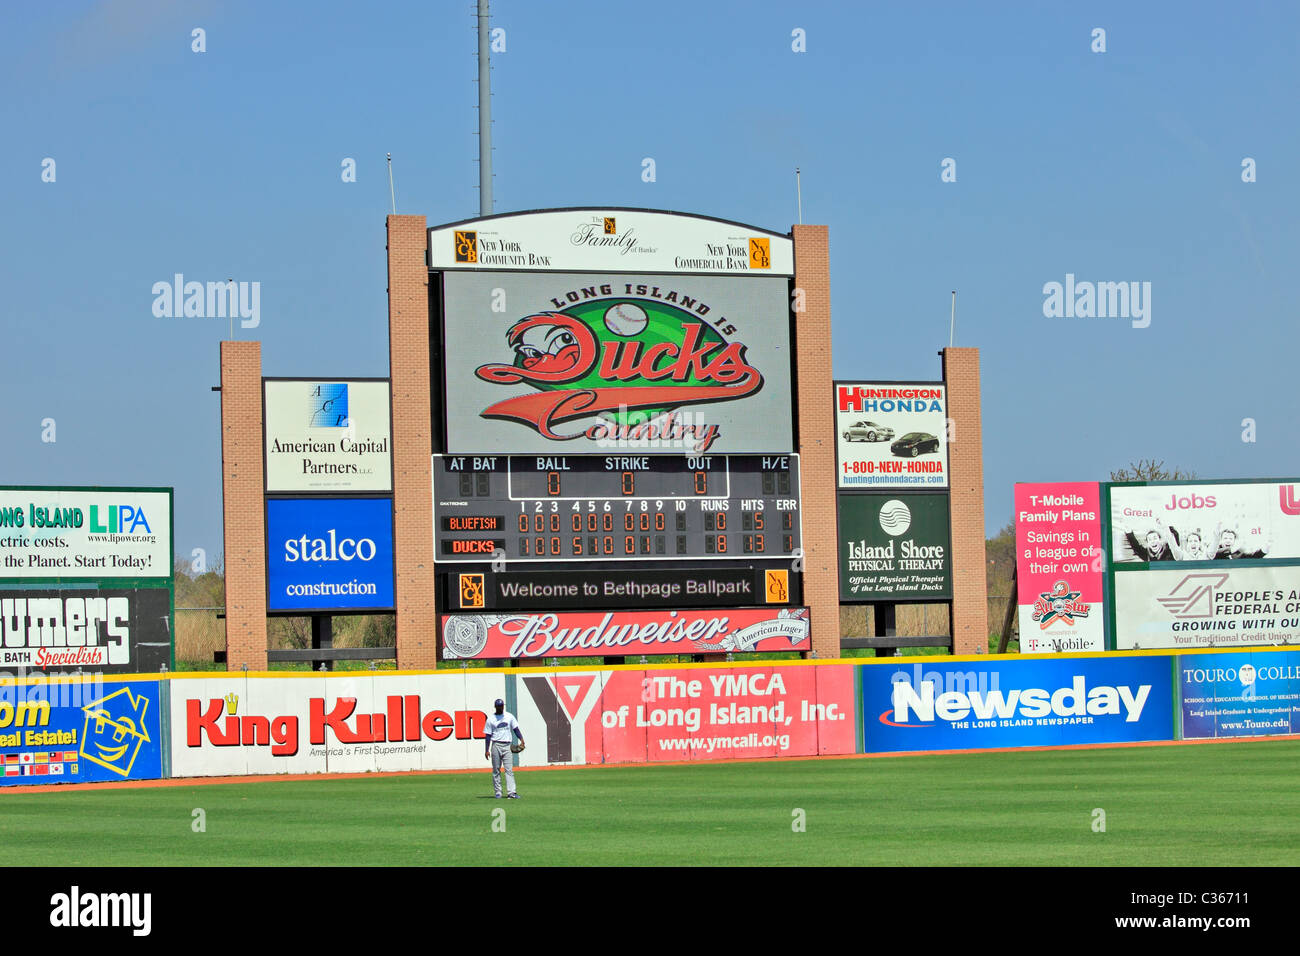 Long Island Ducks Baseball Stadium